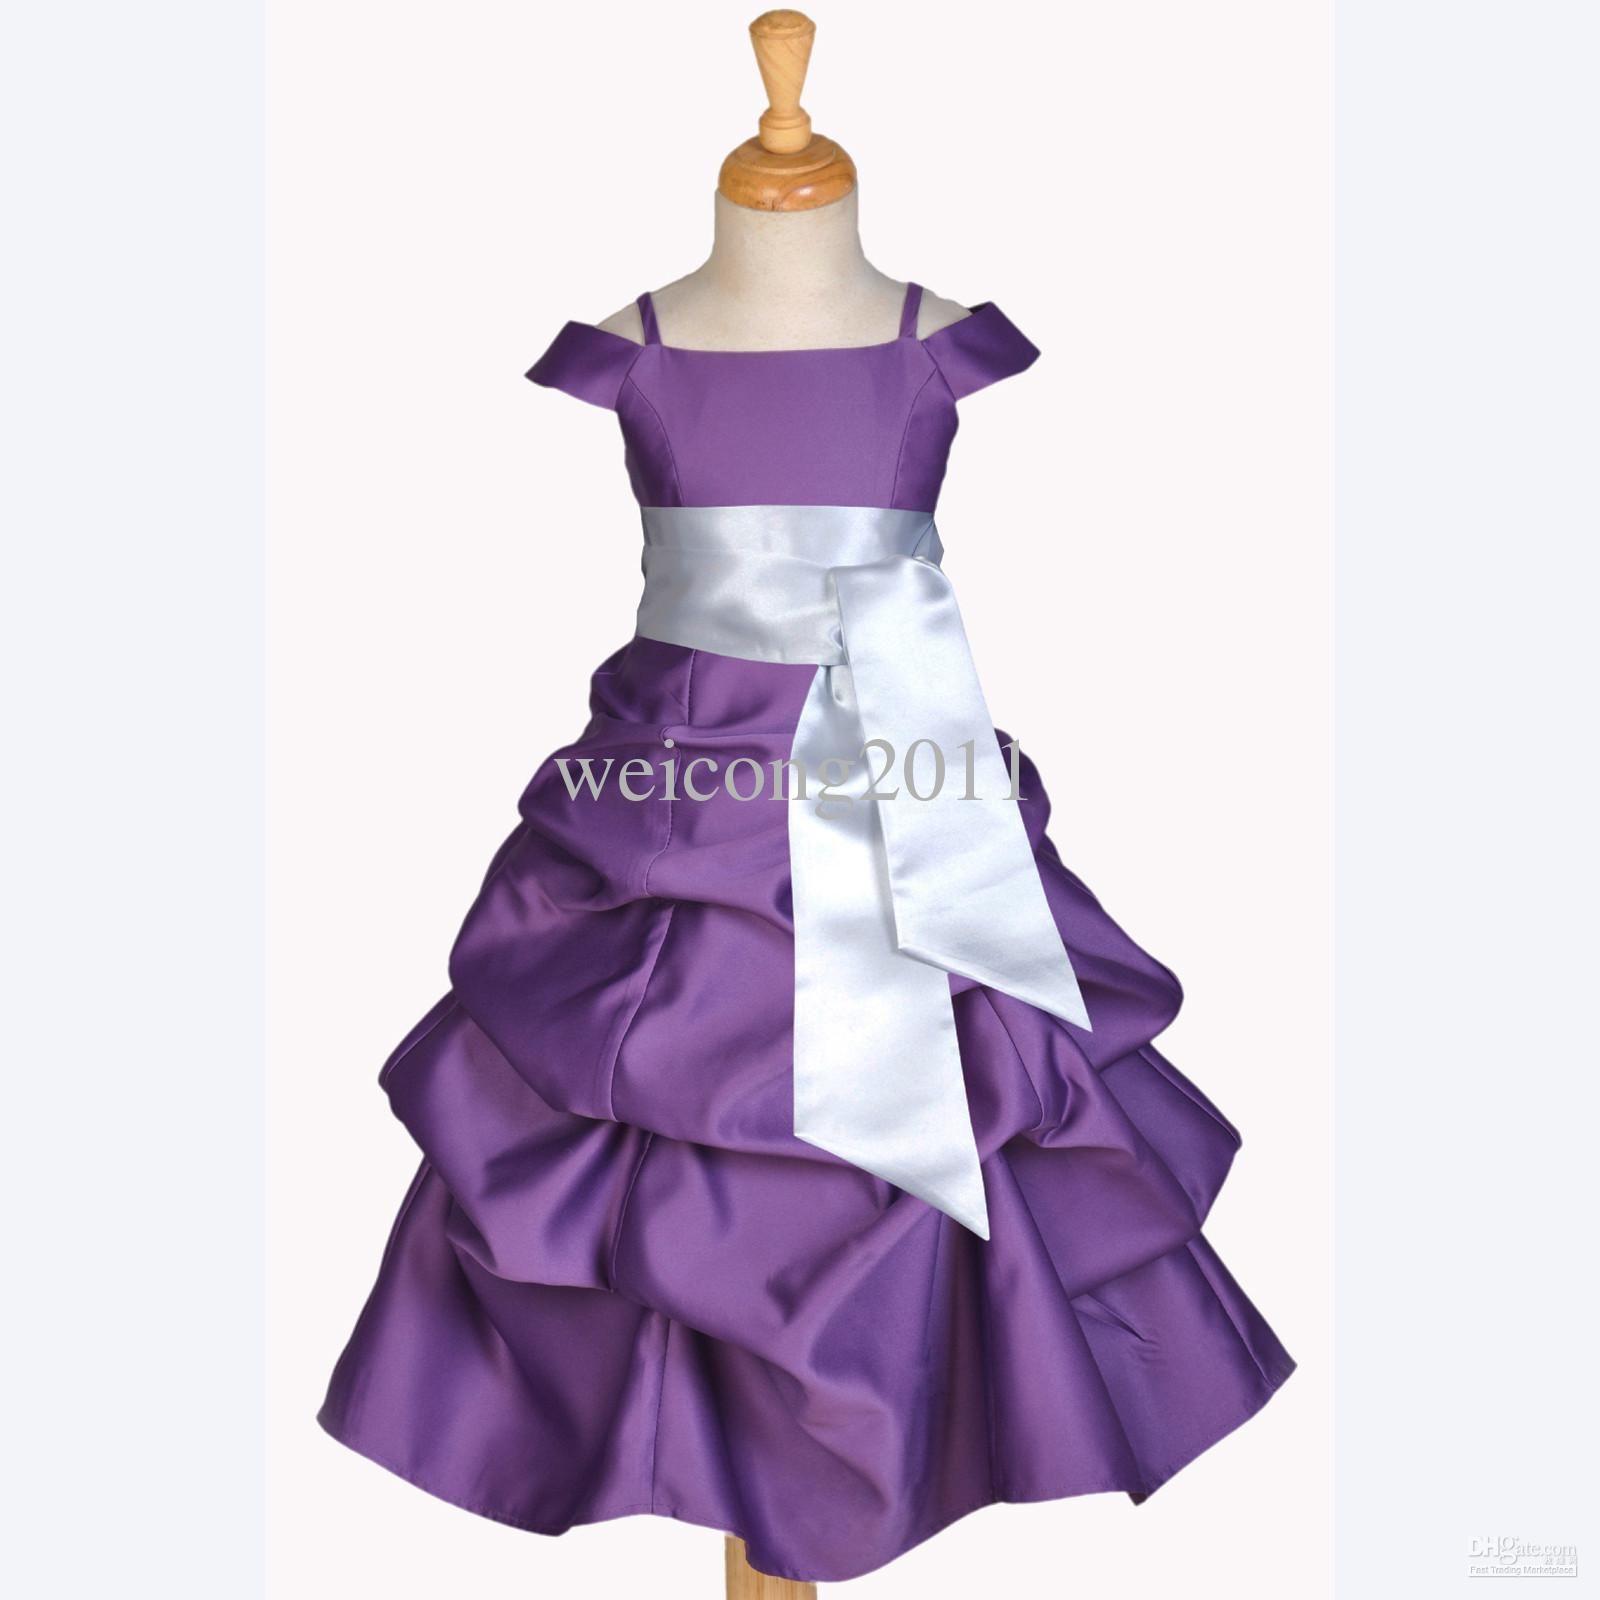 Wholesale CHILDREN FLOWER GIRL DRESS PLUM PURPLE SILVER WEDDING ...